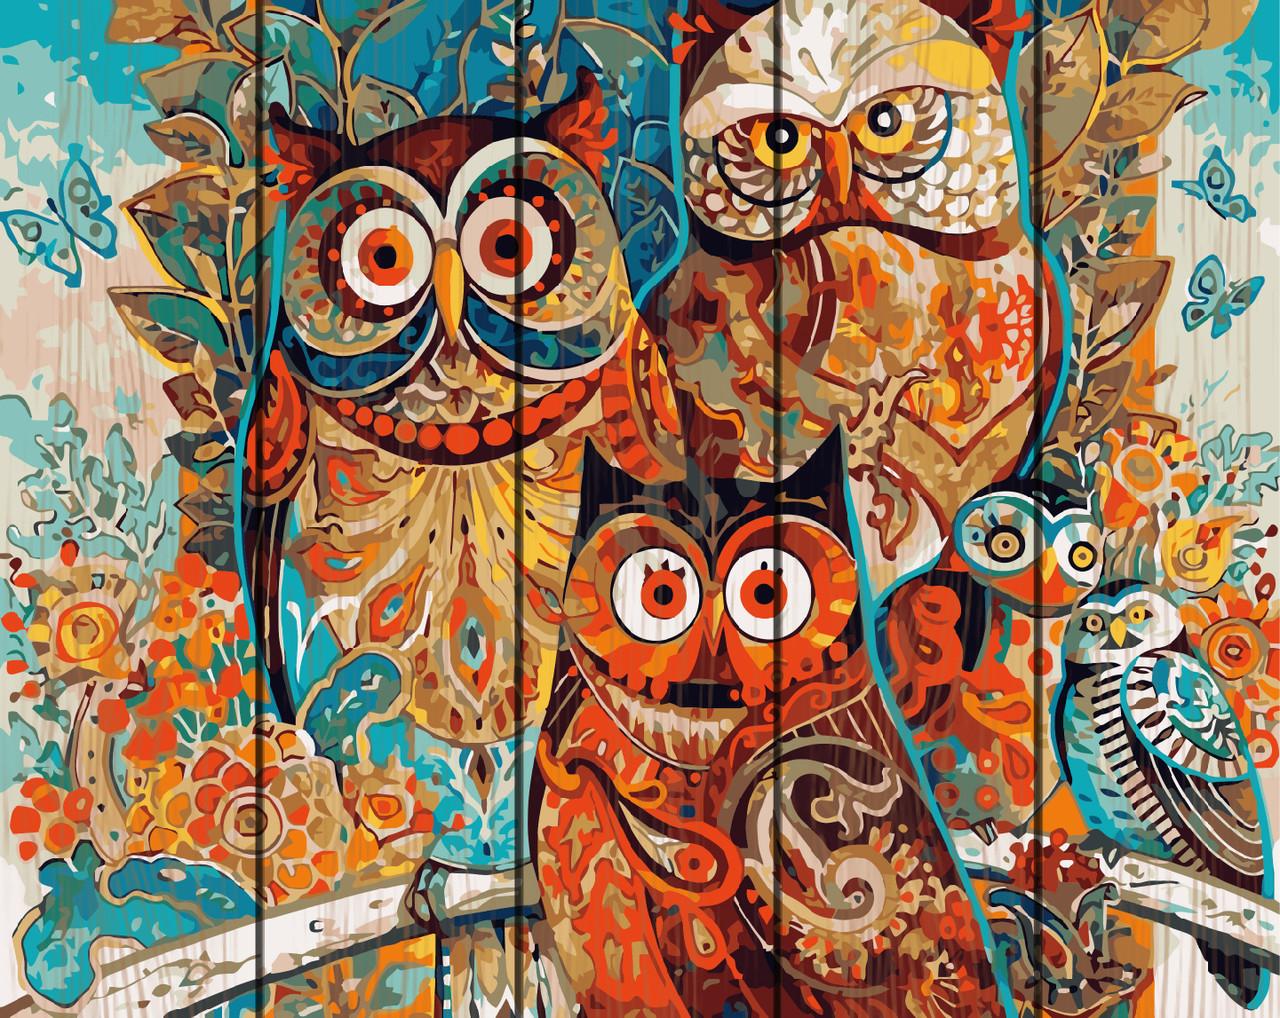 PREMIUM Картина по номерам на дереве 40х50 см. Волшебные совы Rainbow Art